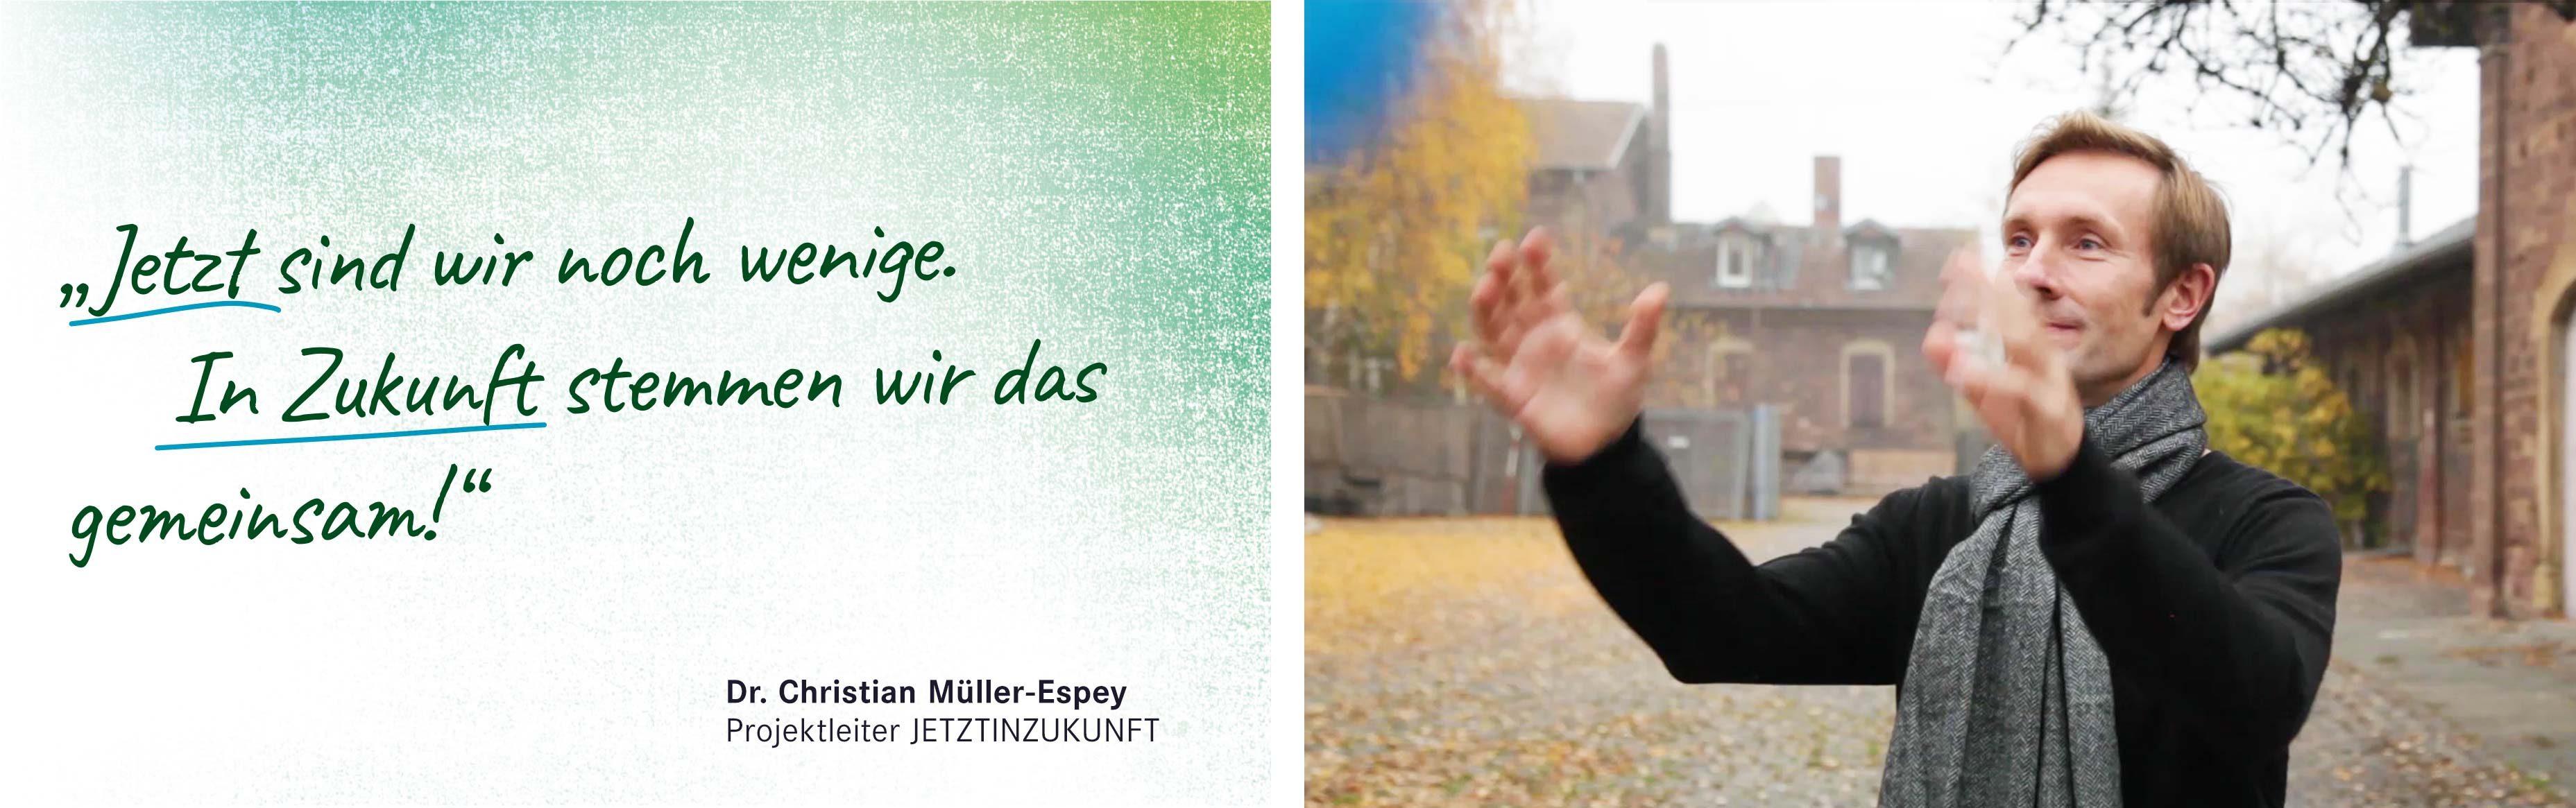 https://www.jetztinzukunft.de/wp-content/uploads/2019/06/jizu_web_bild_1-3713x1165.jpg